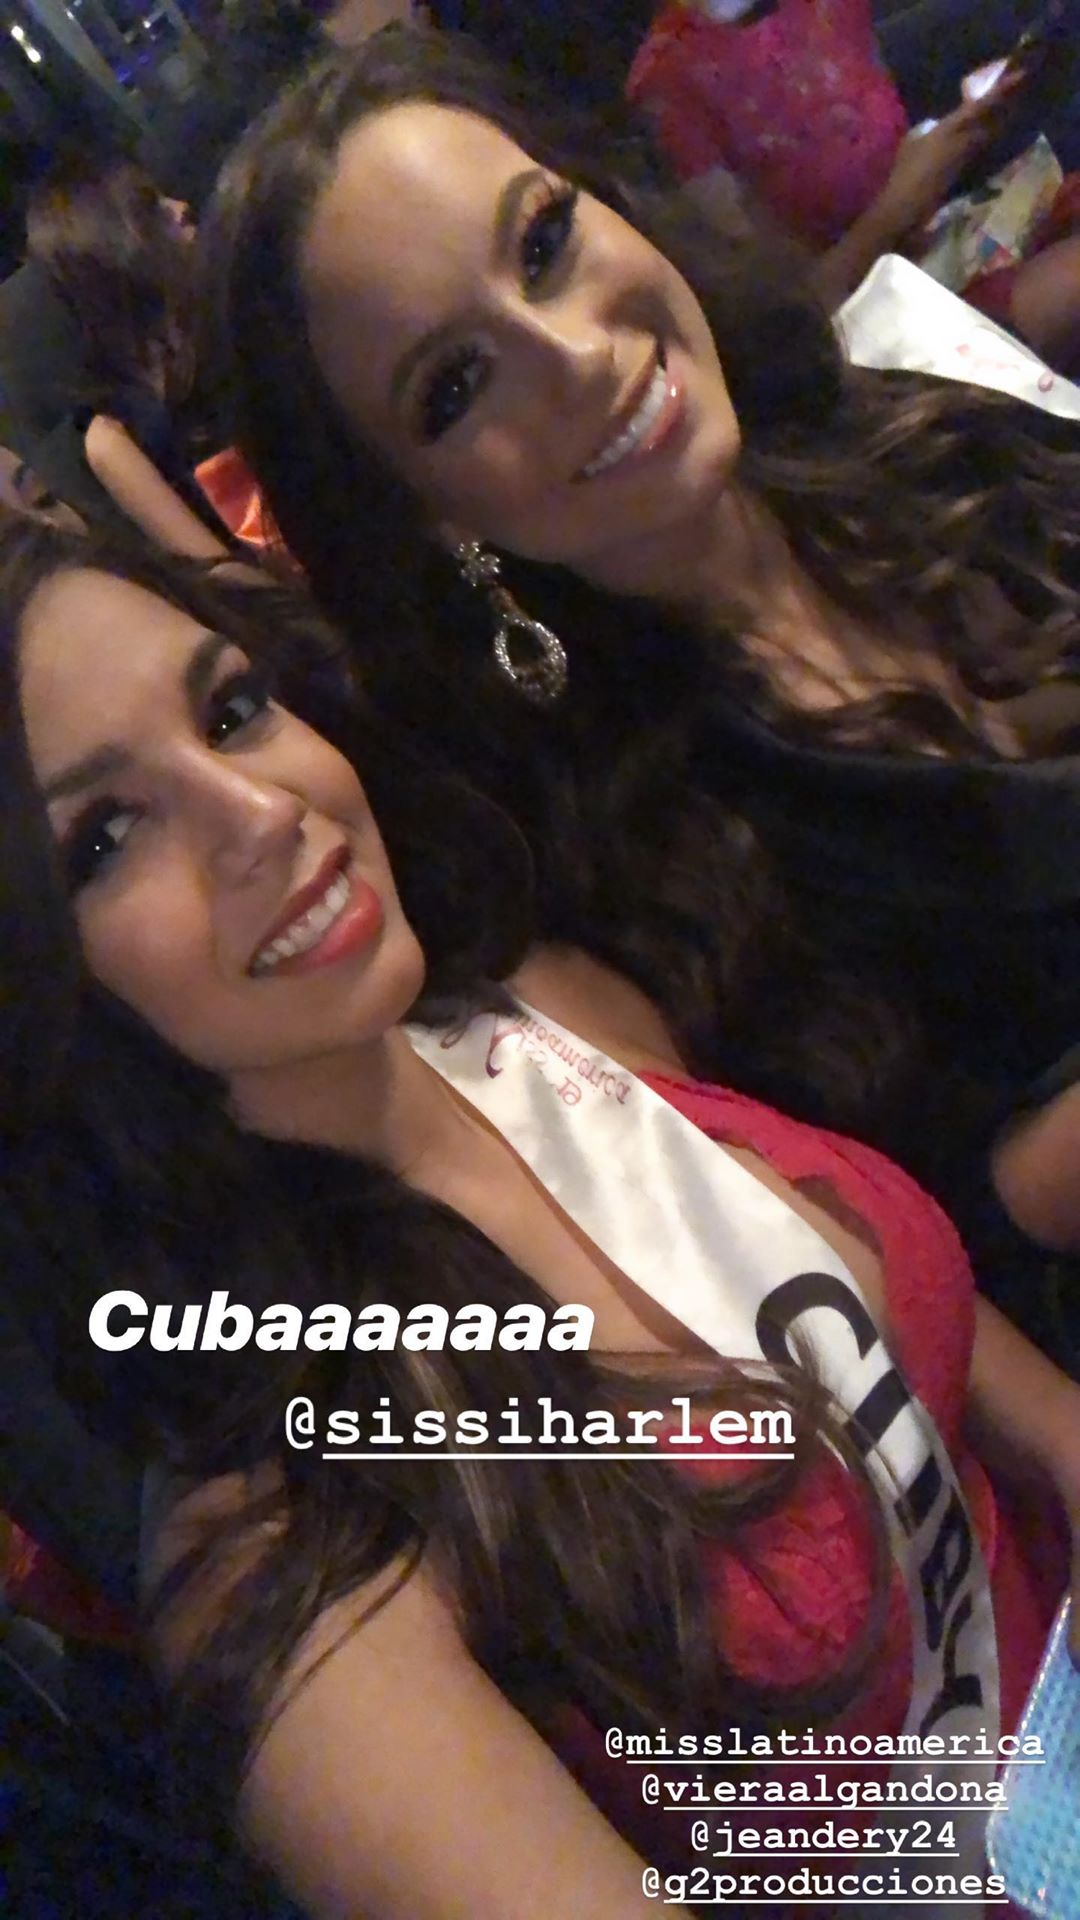 cristine boff sartor, segunda finalista de miss latinoamerica 2019. - Página 8 69097010